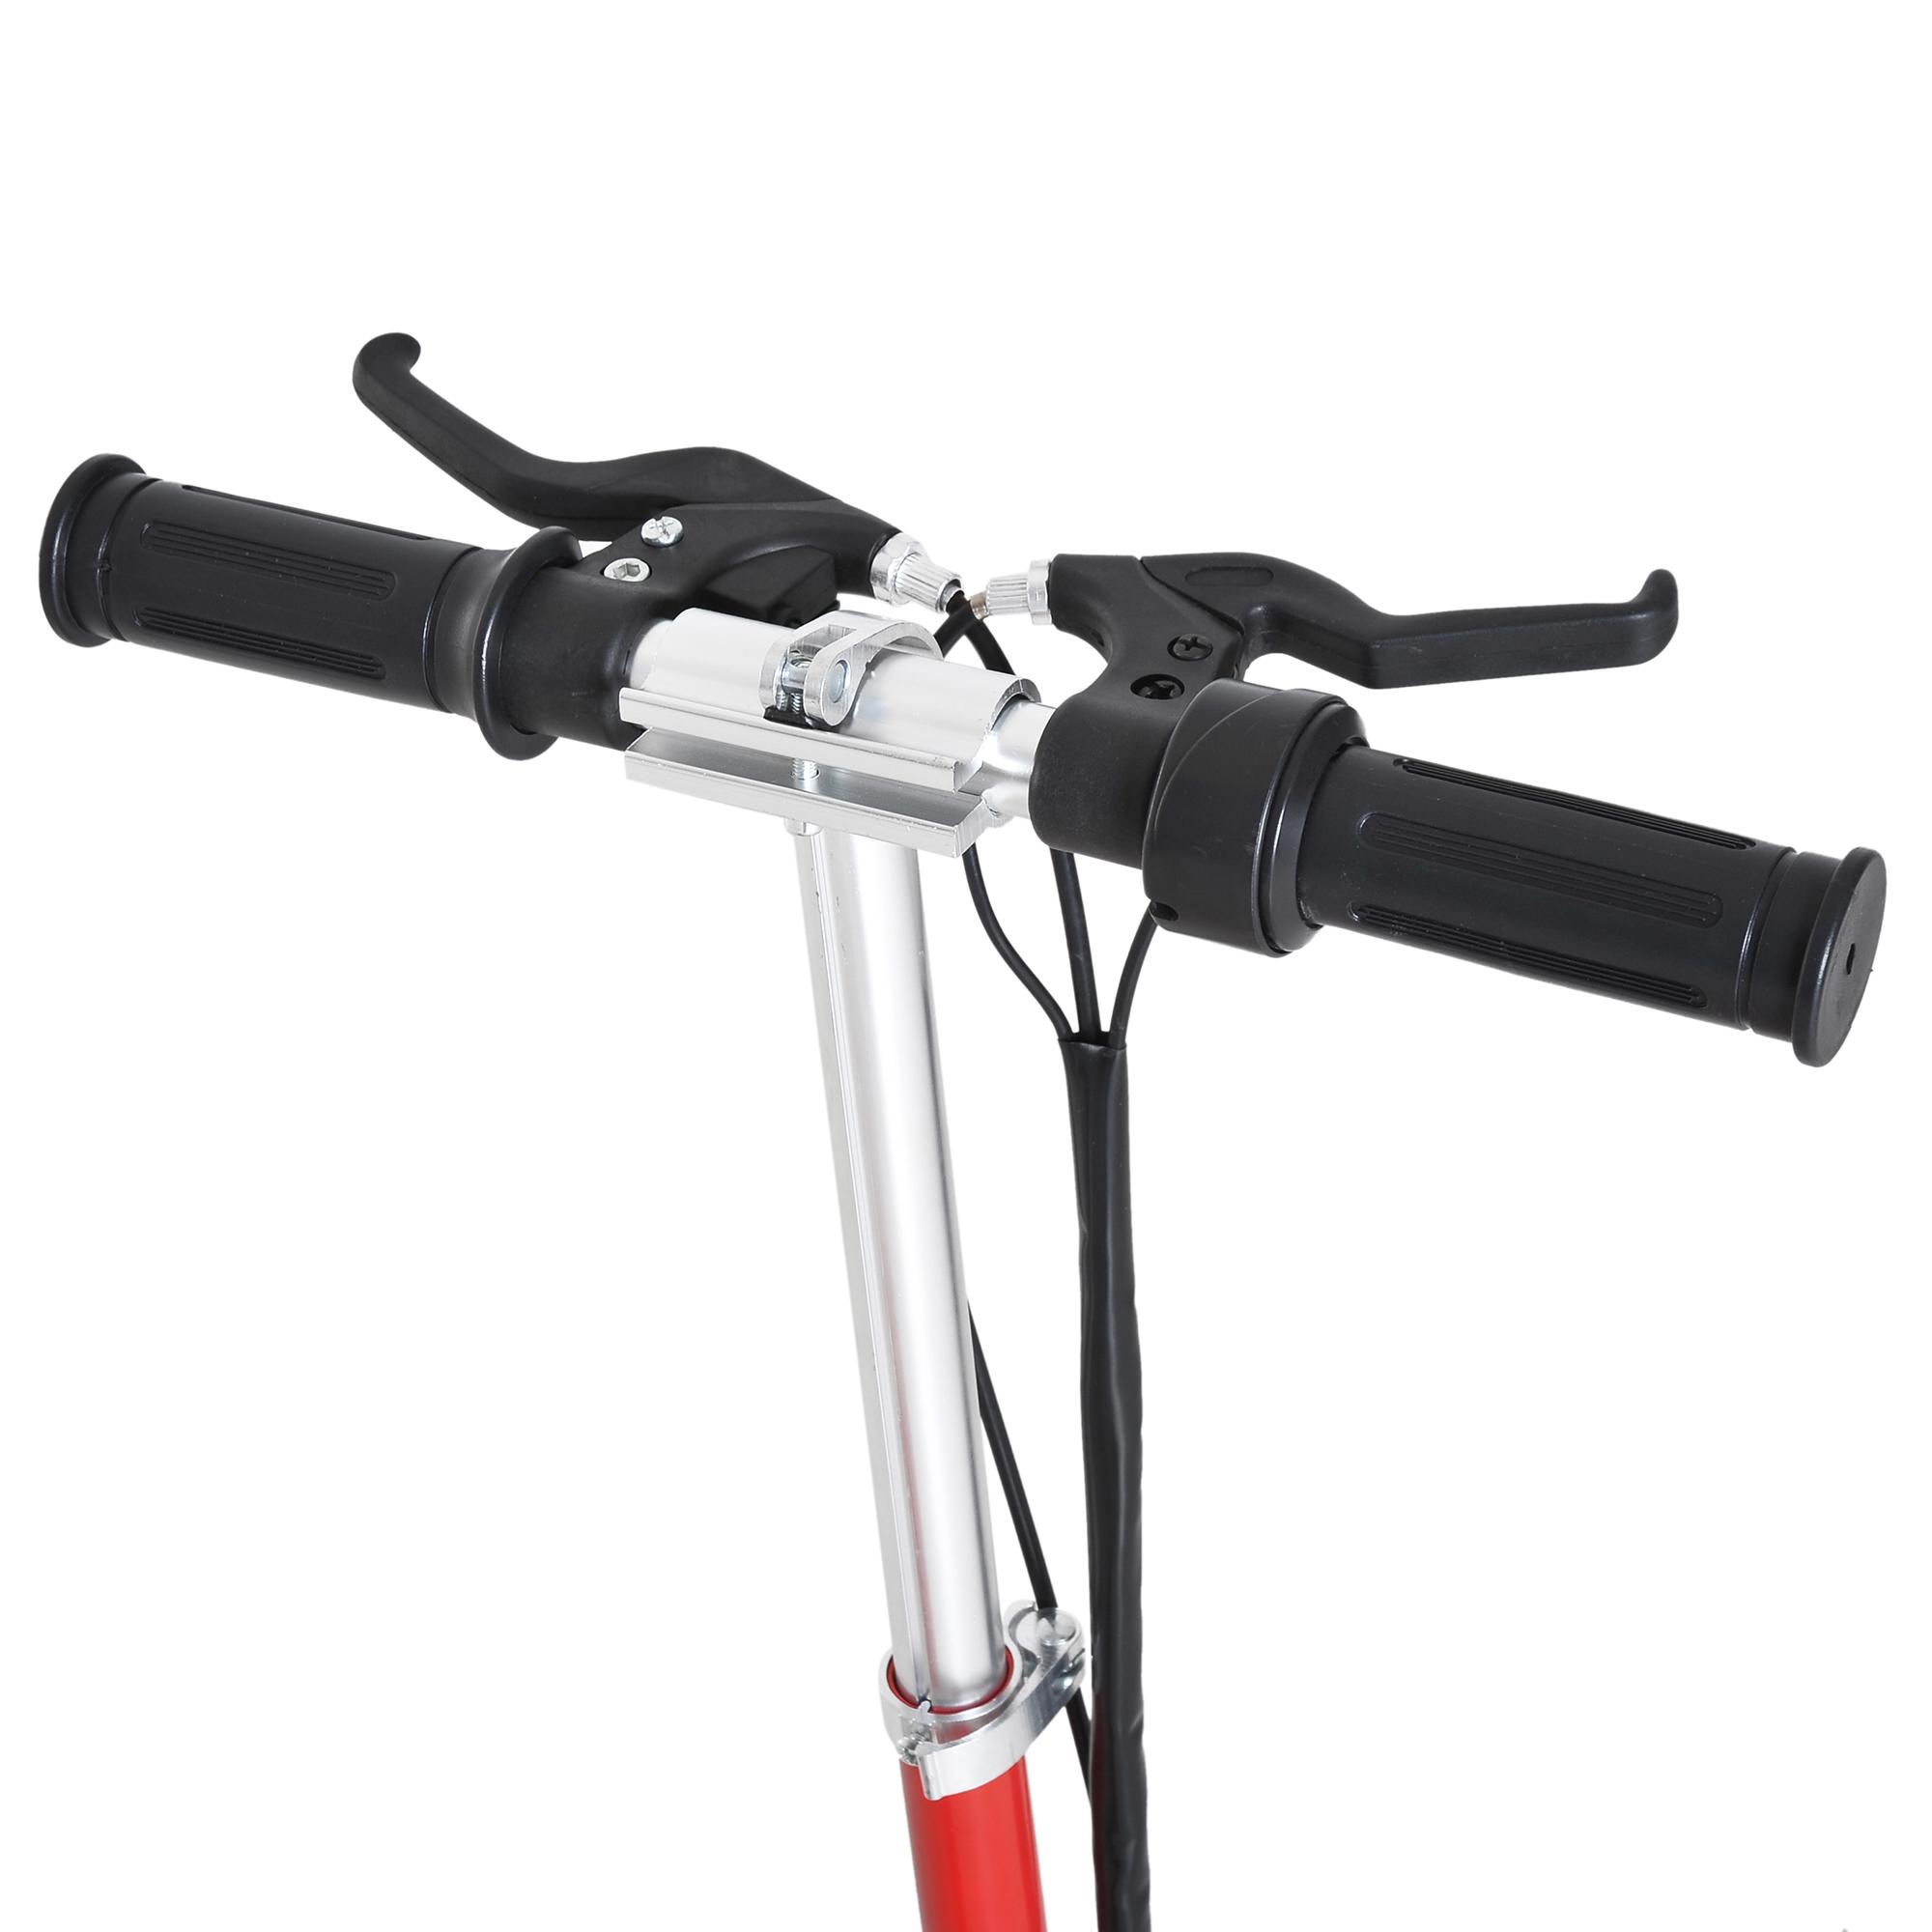 ElektrGoldller klappbar E-Scooter Cityroller höhenverstellbar höhenverstellbar höhenverstellbar 12 km h 2 Farben 6a6b47